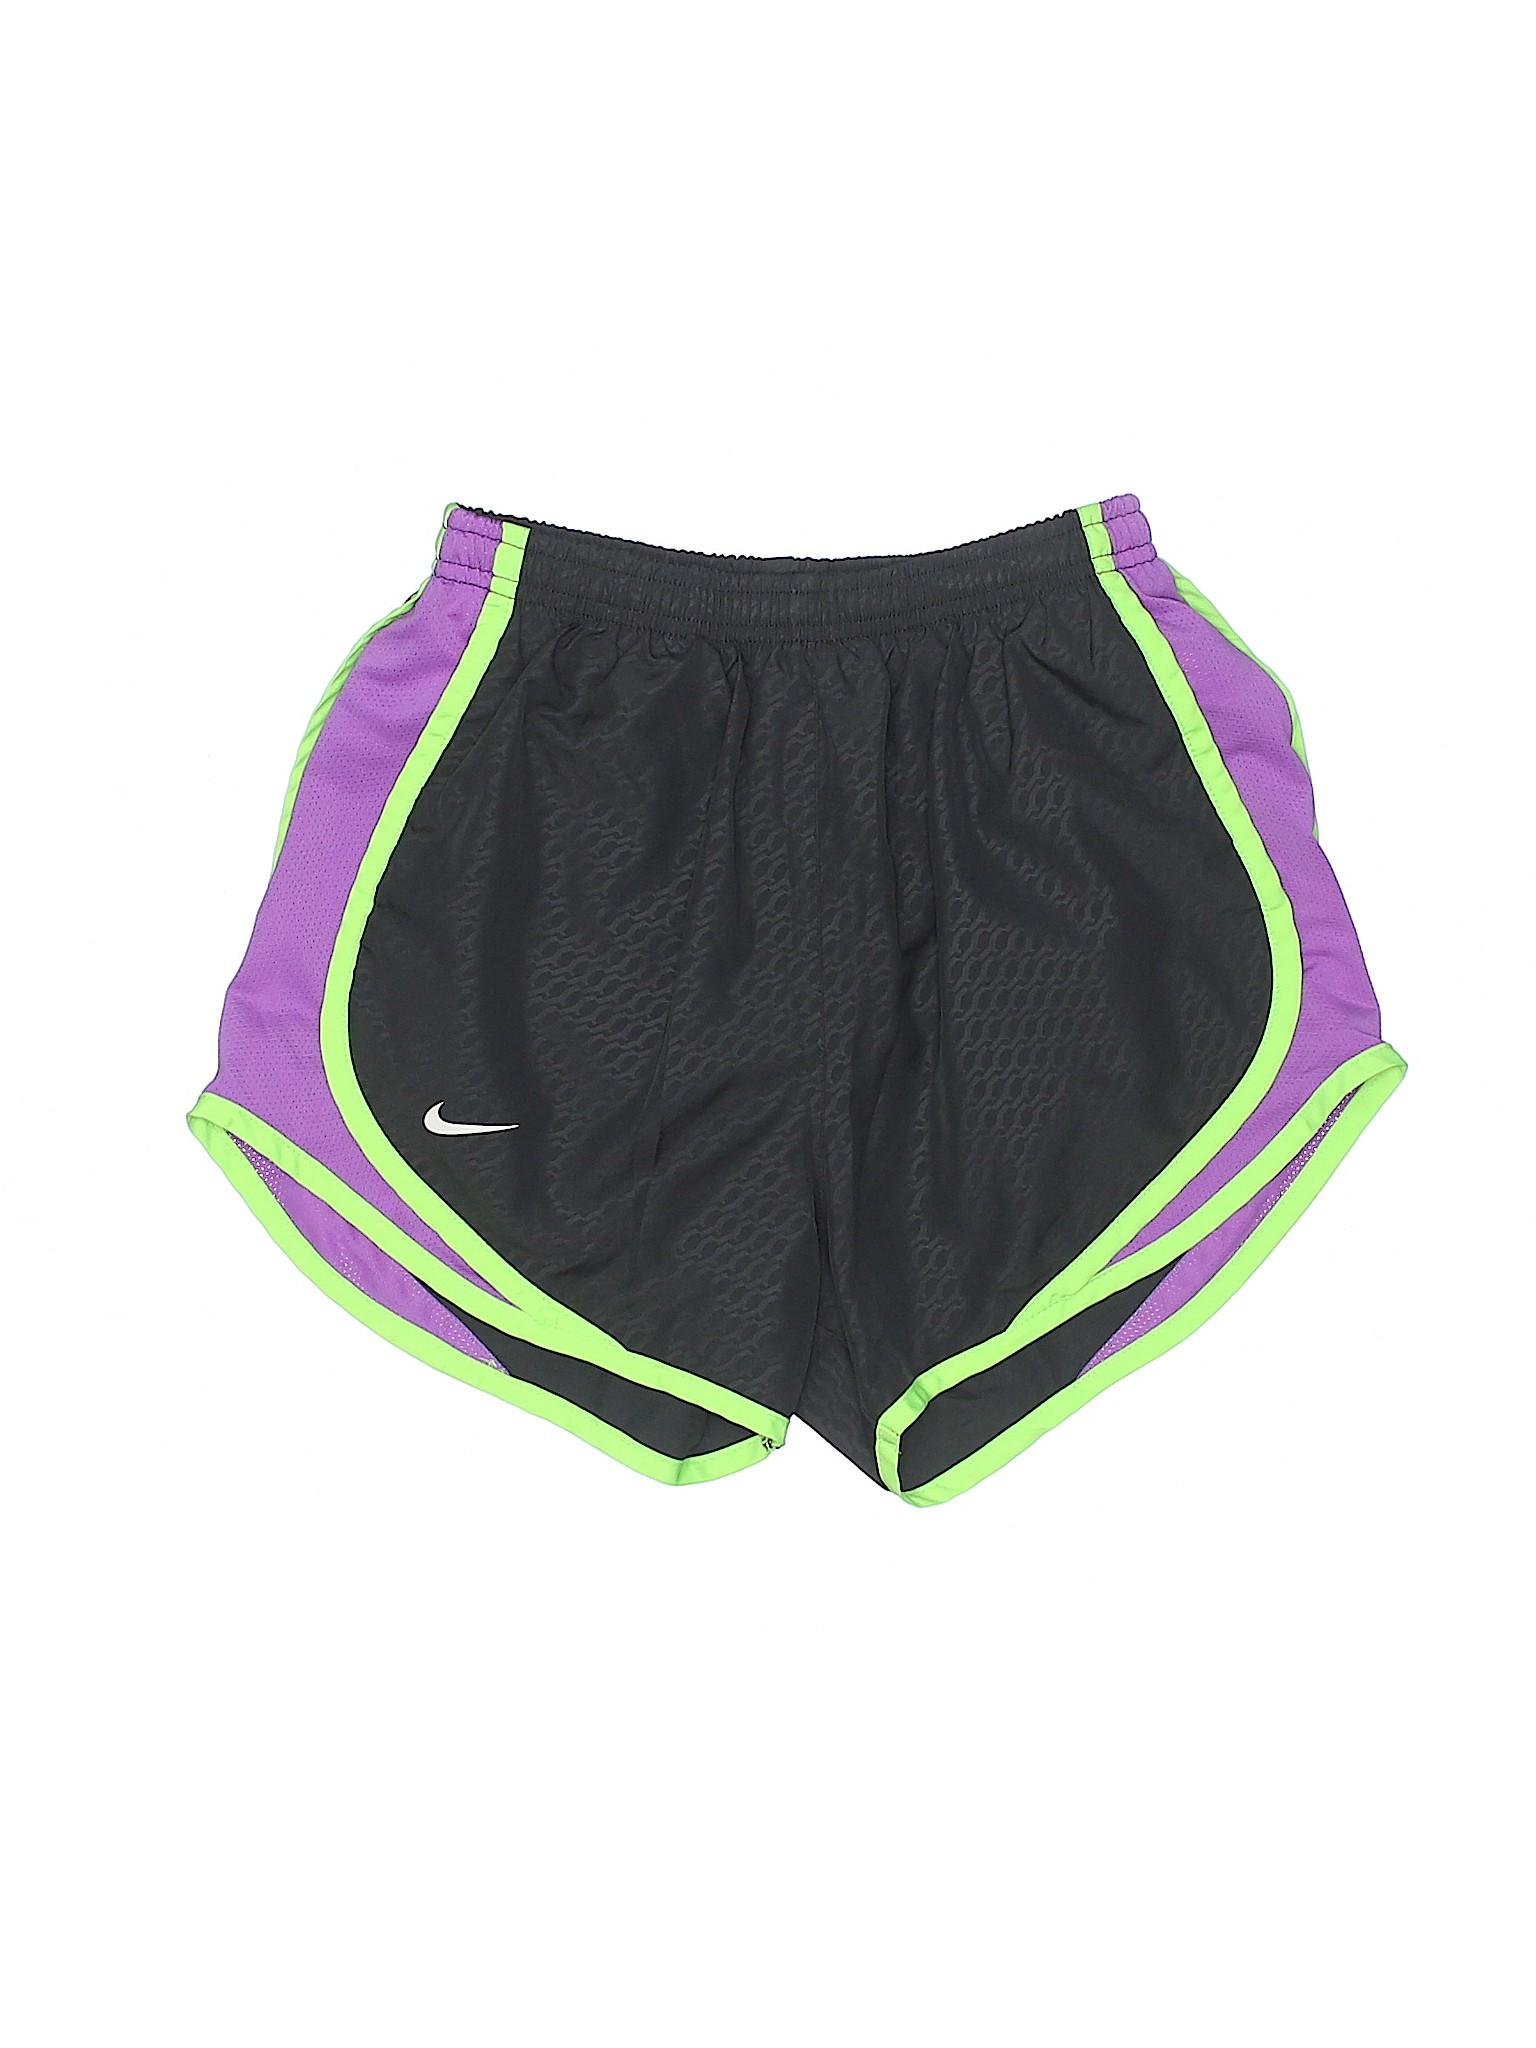 Athletic Shorts Boutique Boutique Nike Nike Shorts Shorts Nike Athletic Athletic Boutique 07gZf0YHvq